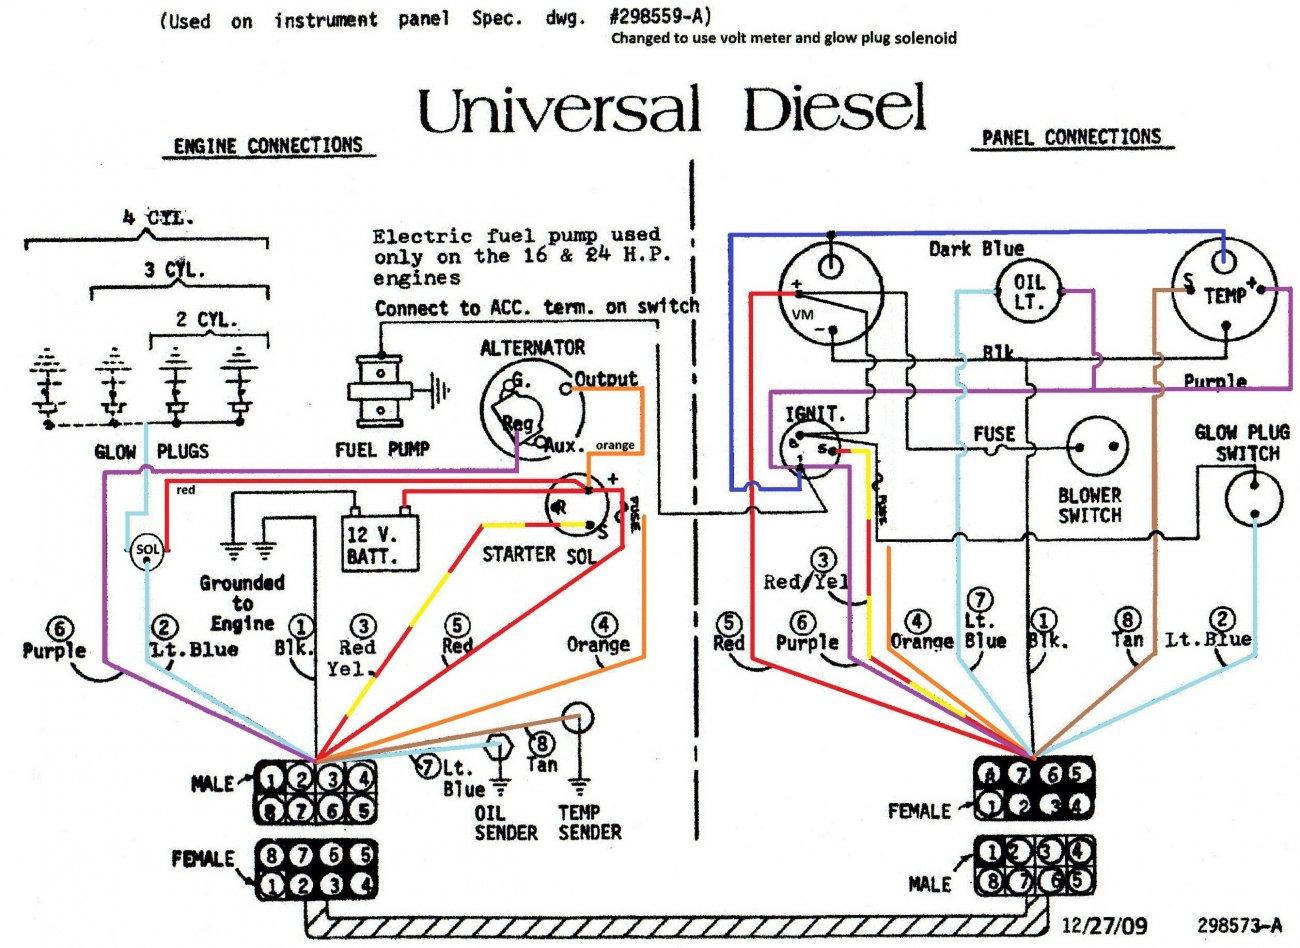 Engine Wiring harness diagram.jpg